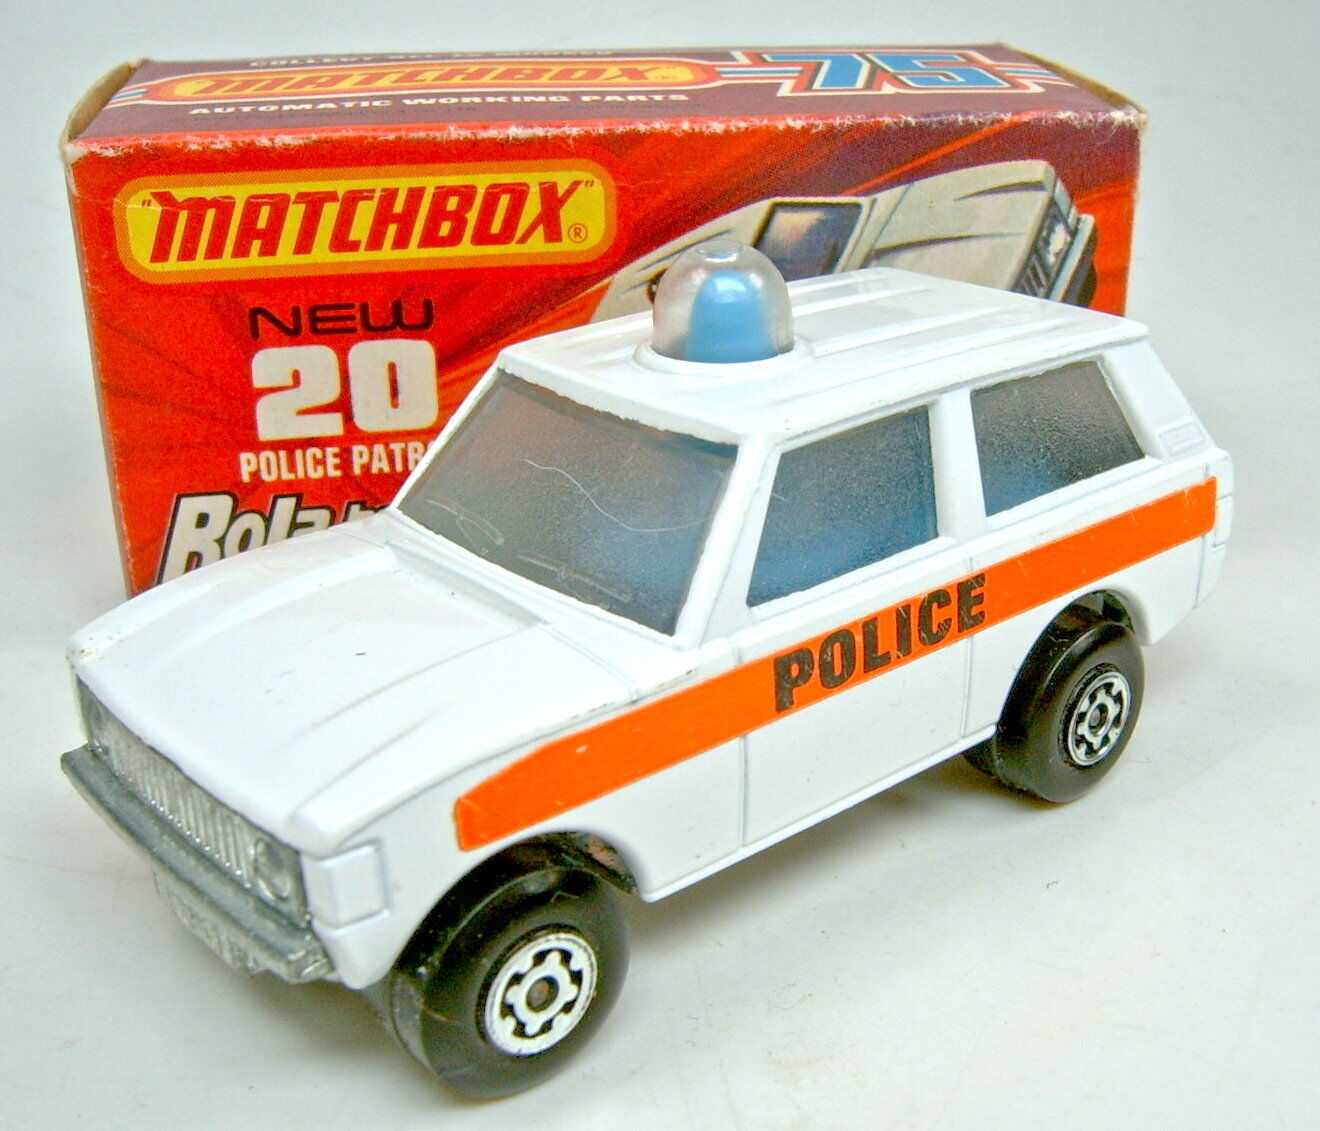 Matchbox SF Nr.20B Police Police Police Patrol white  Police  bluee Leuchte top in Box b8a260